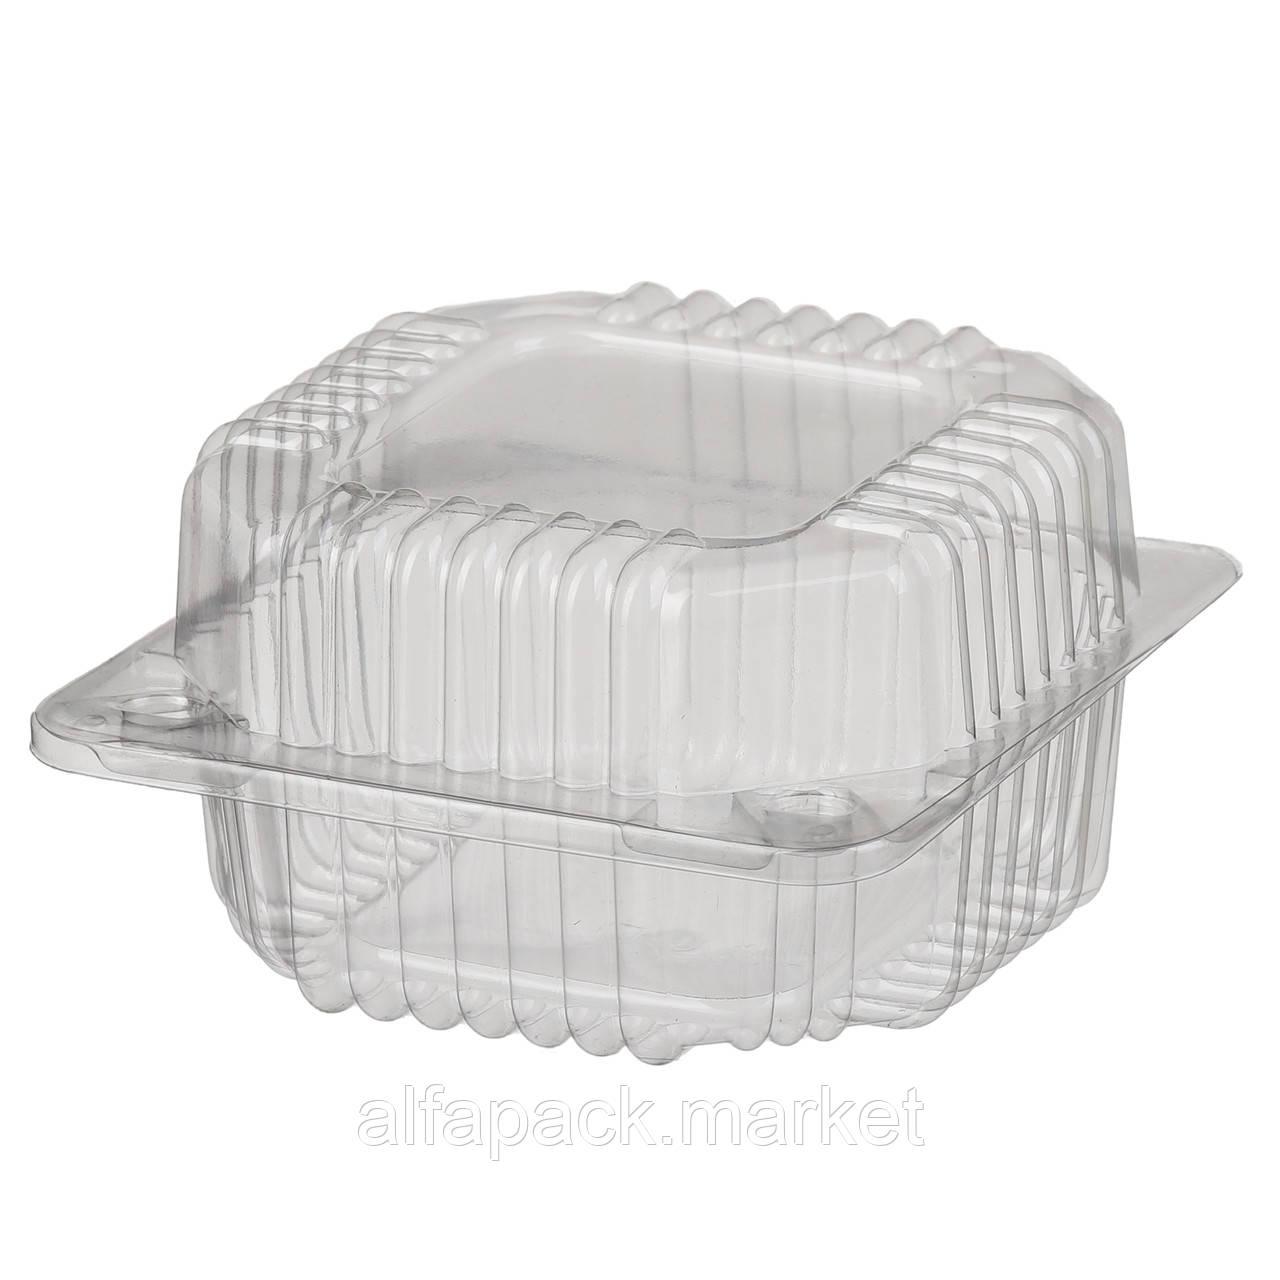 ПС-8 Пластиковий контейнер 110*105*58 (600 шт в ящику) 010100157